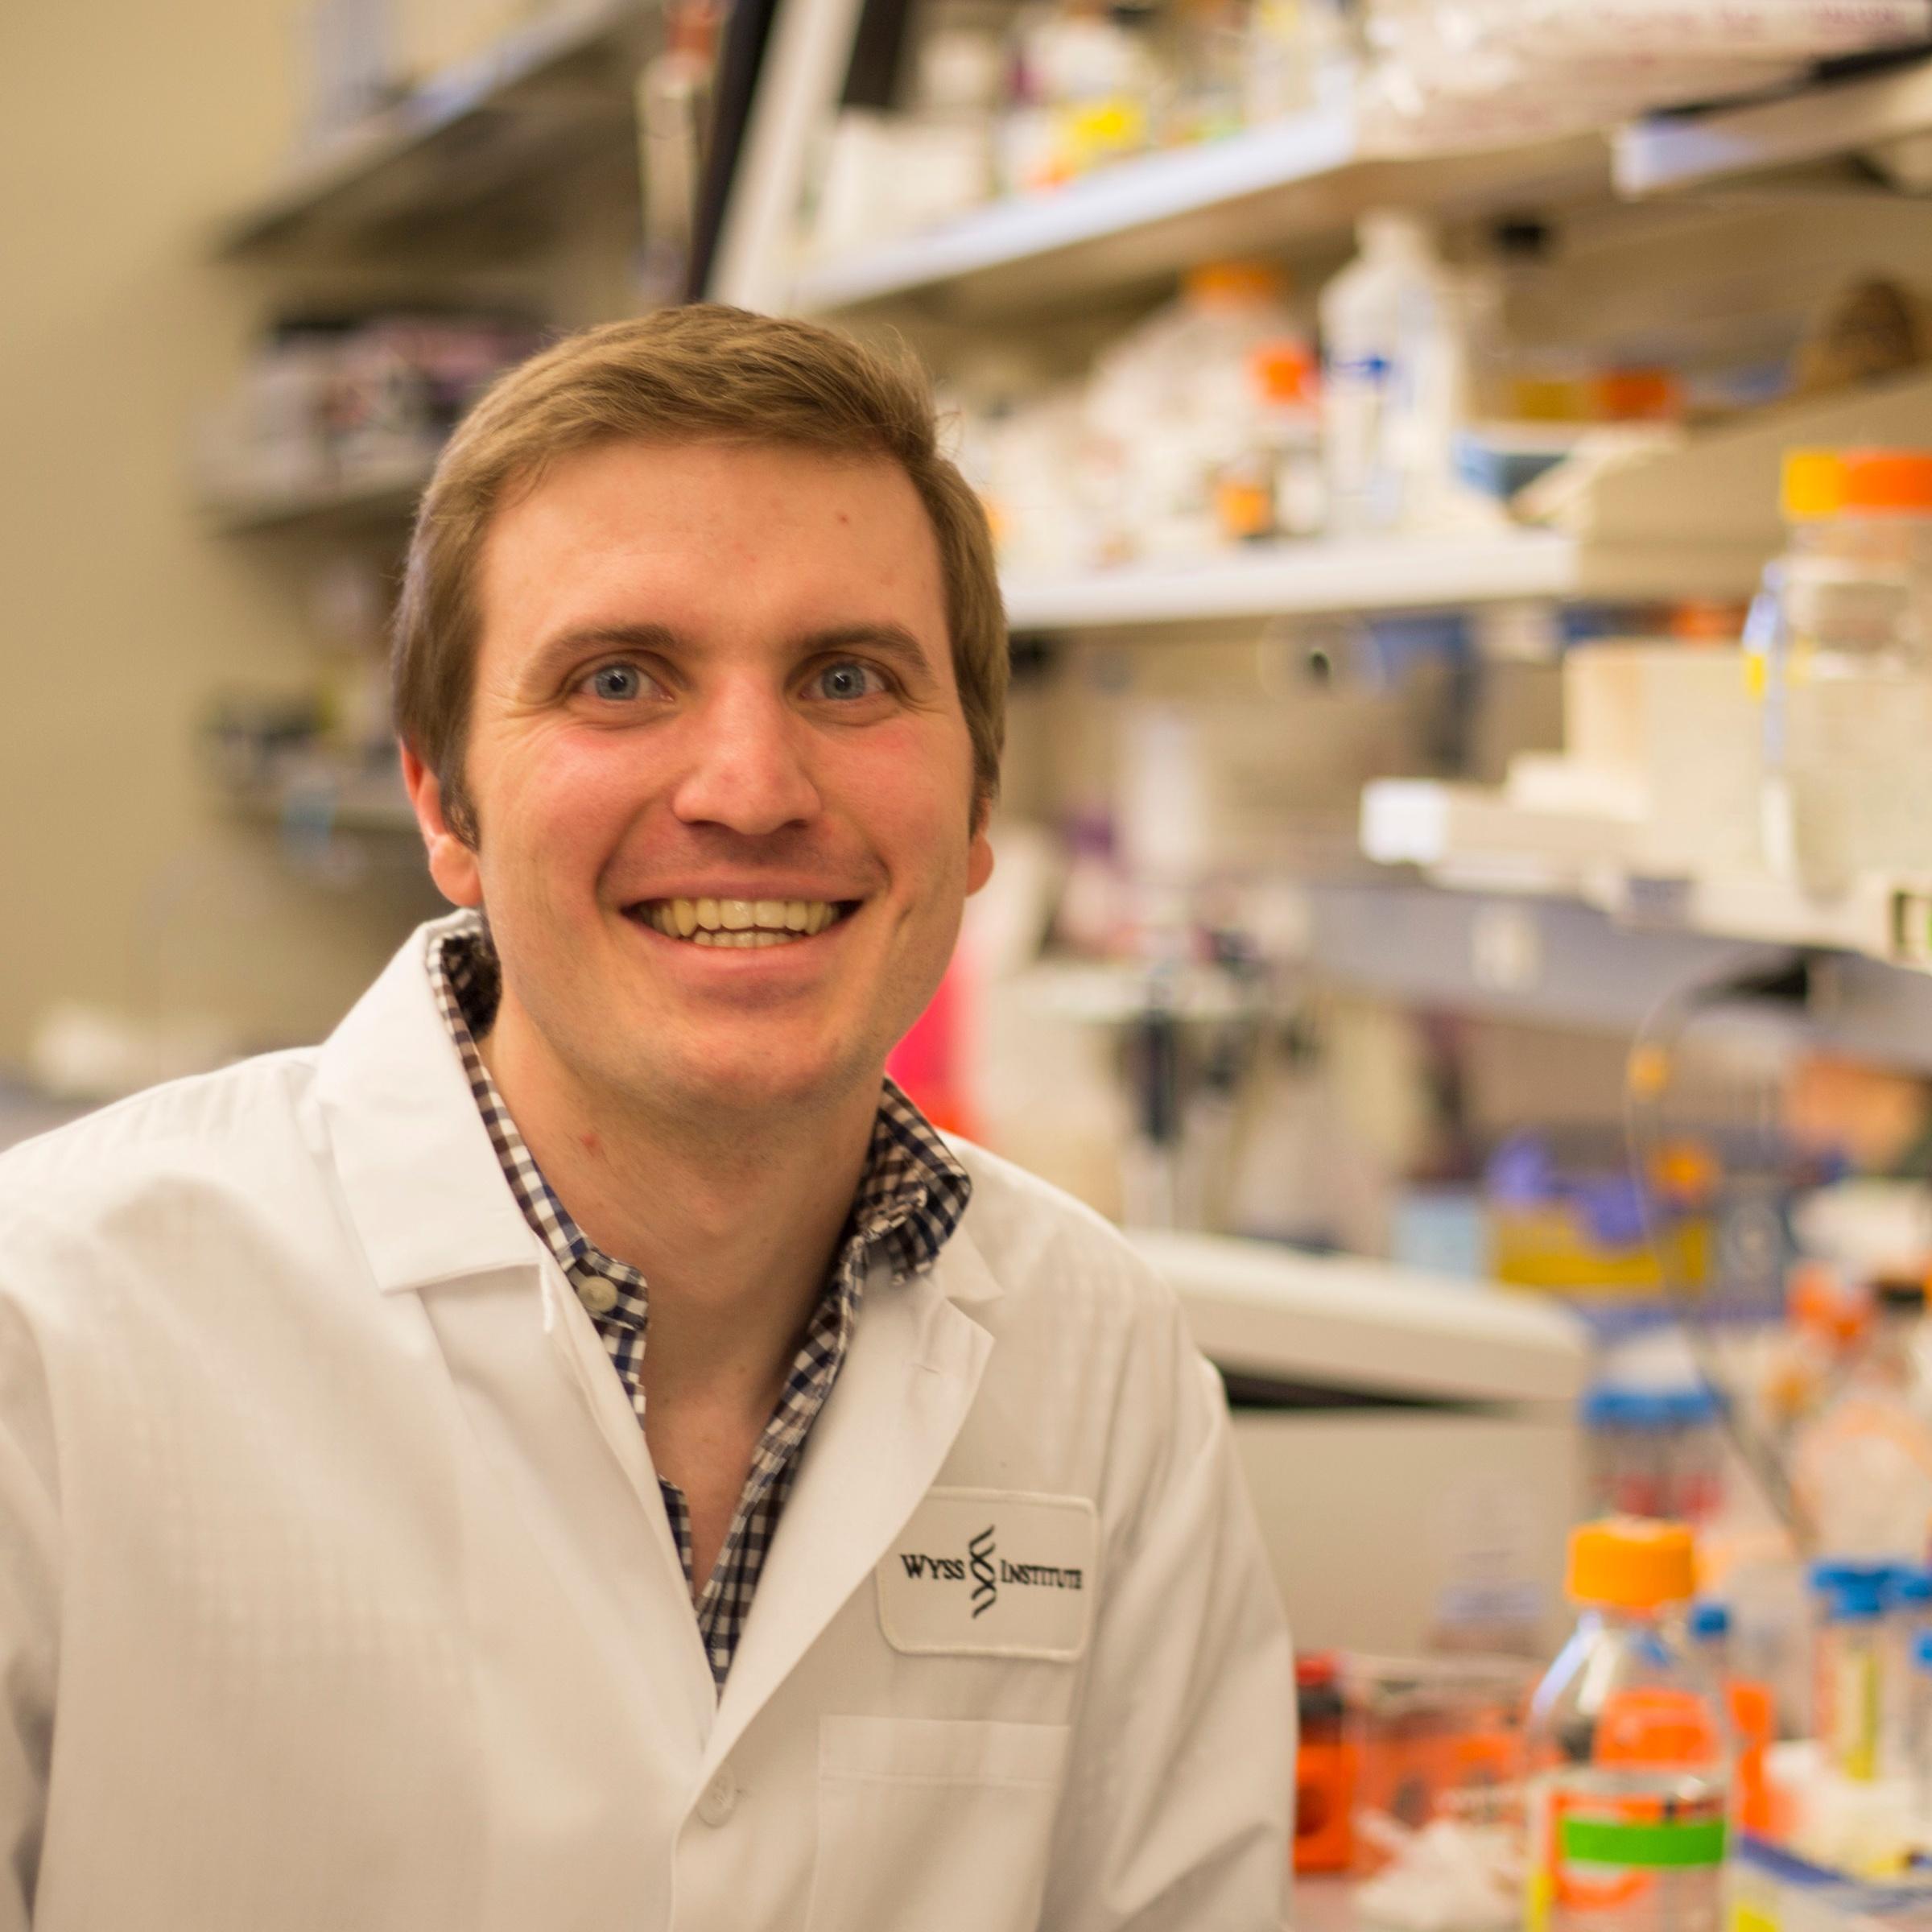 David T. Riglar. Post-doctoral researcher at Harvard Medical School.